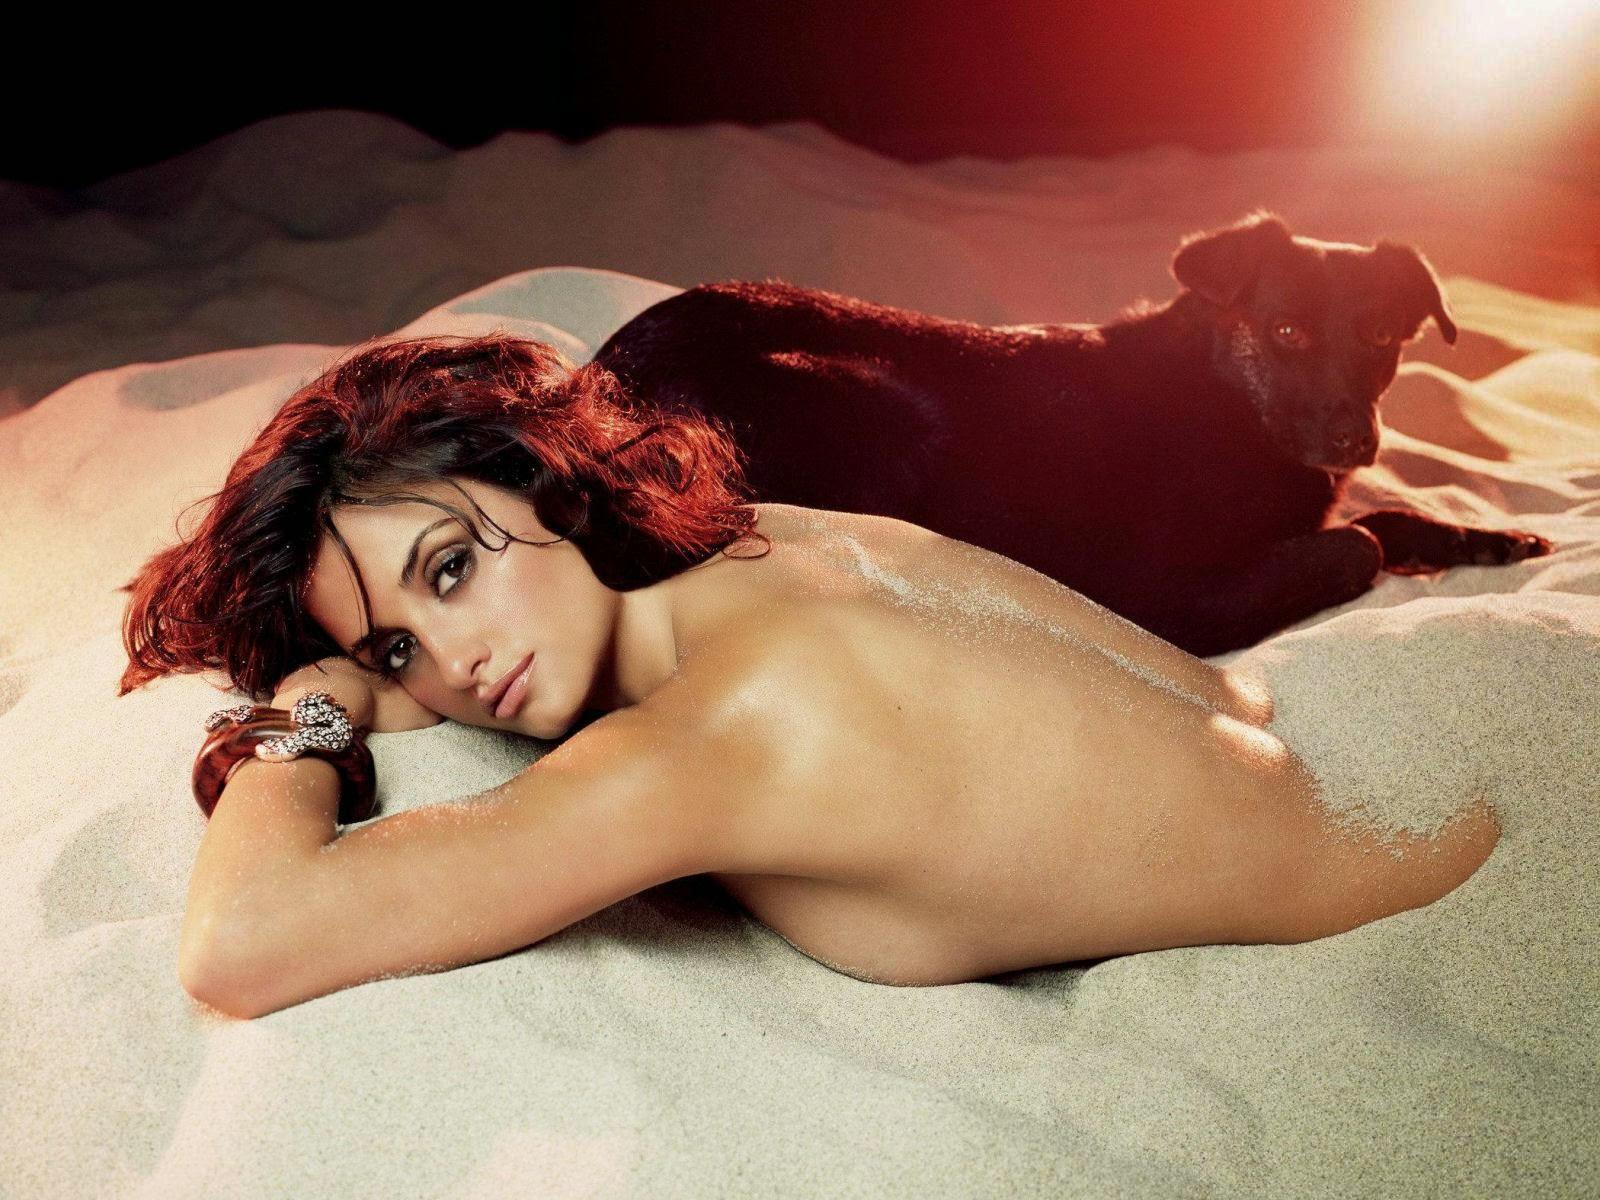 5. Penelope Cruz